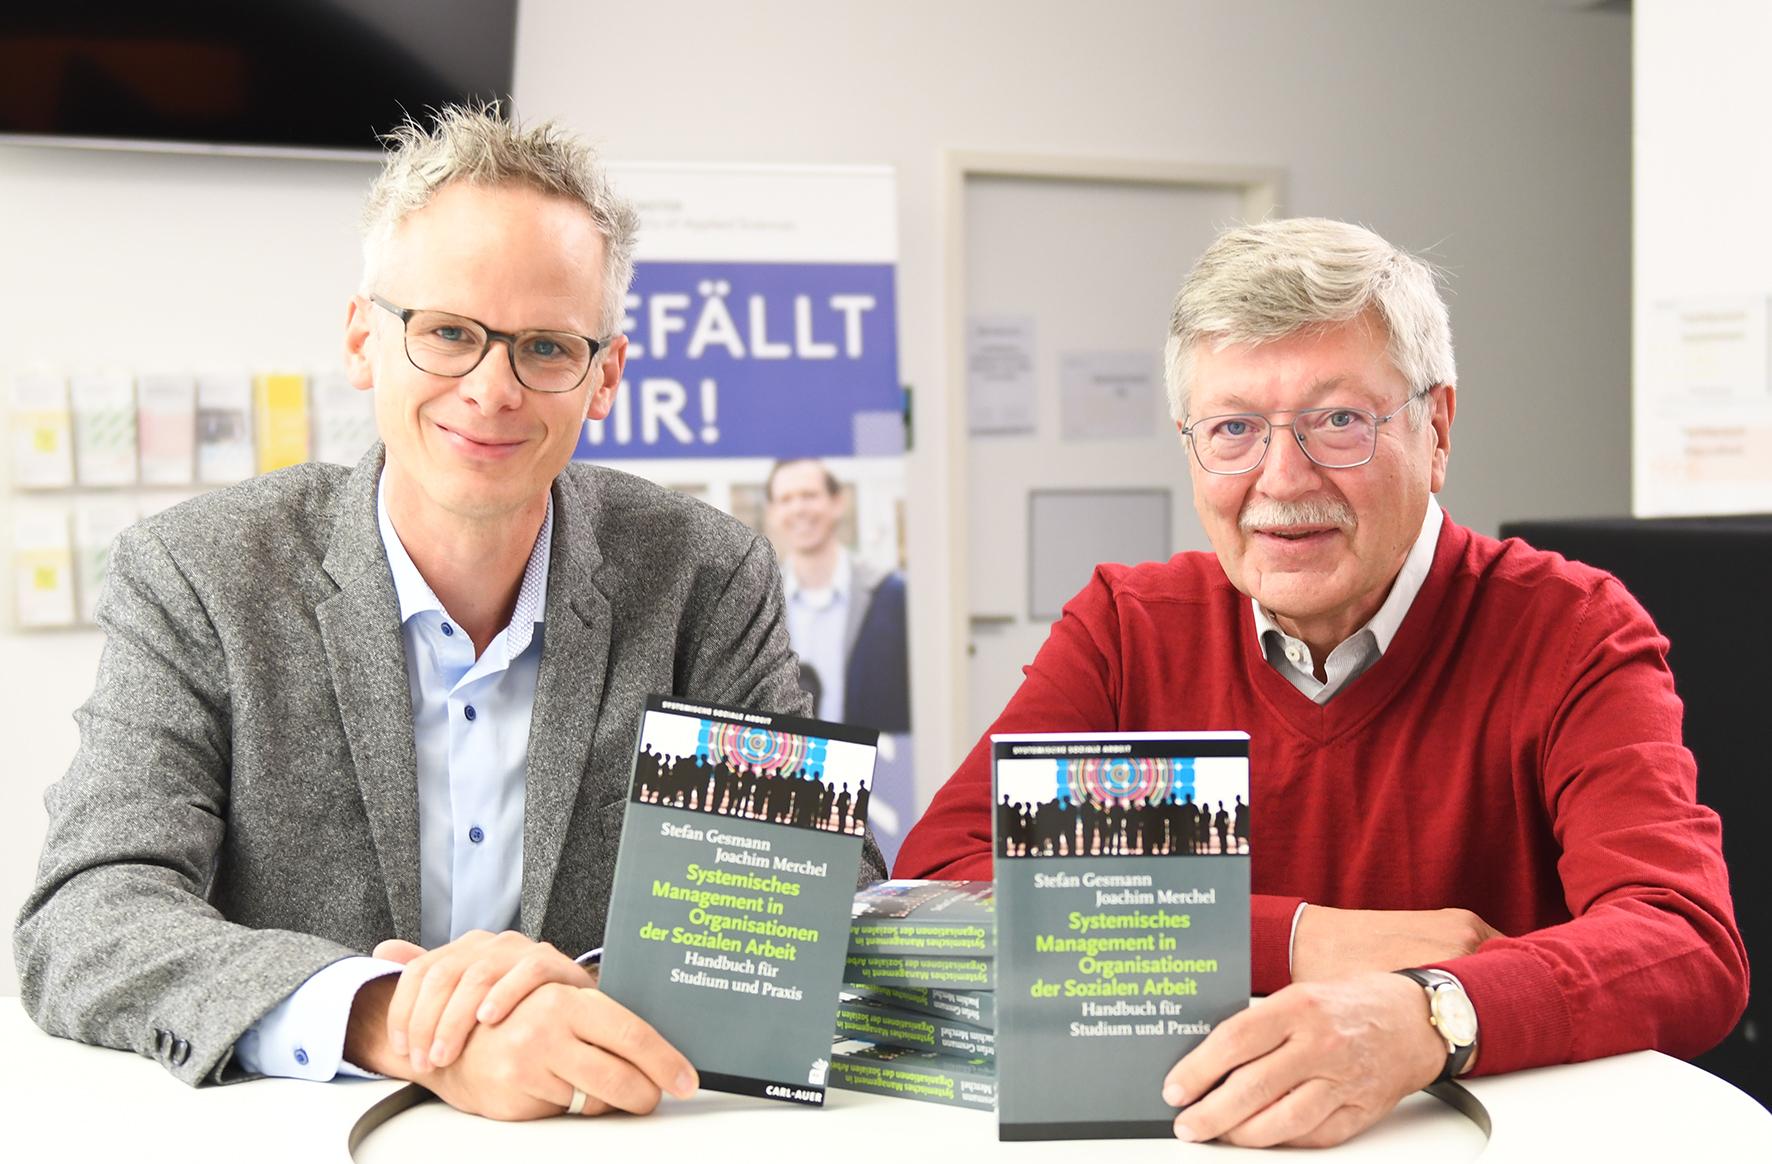 Prof. Dr. Stefan Gesmann und Prof. Dr. Joachim Merchel